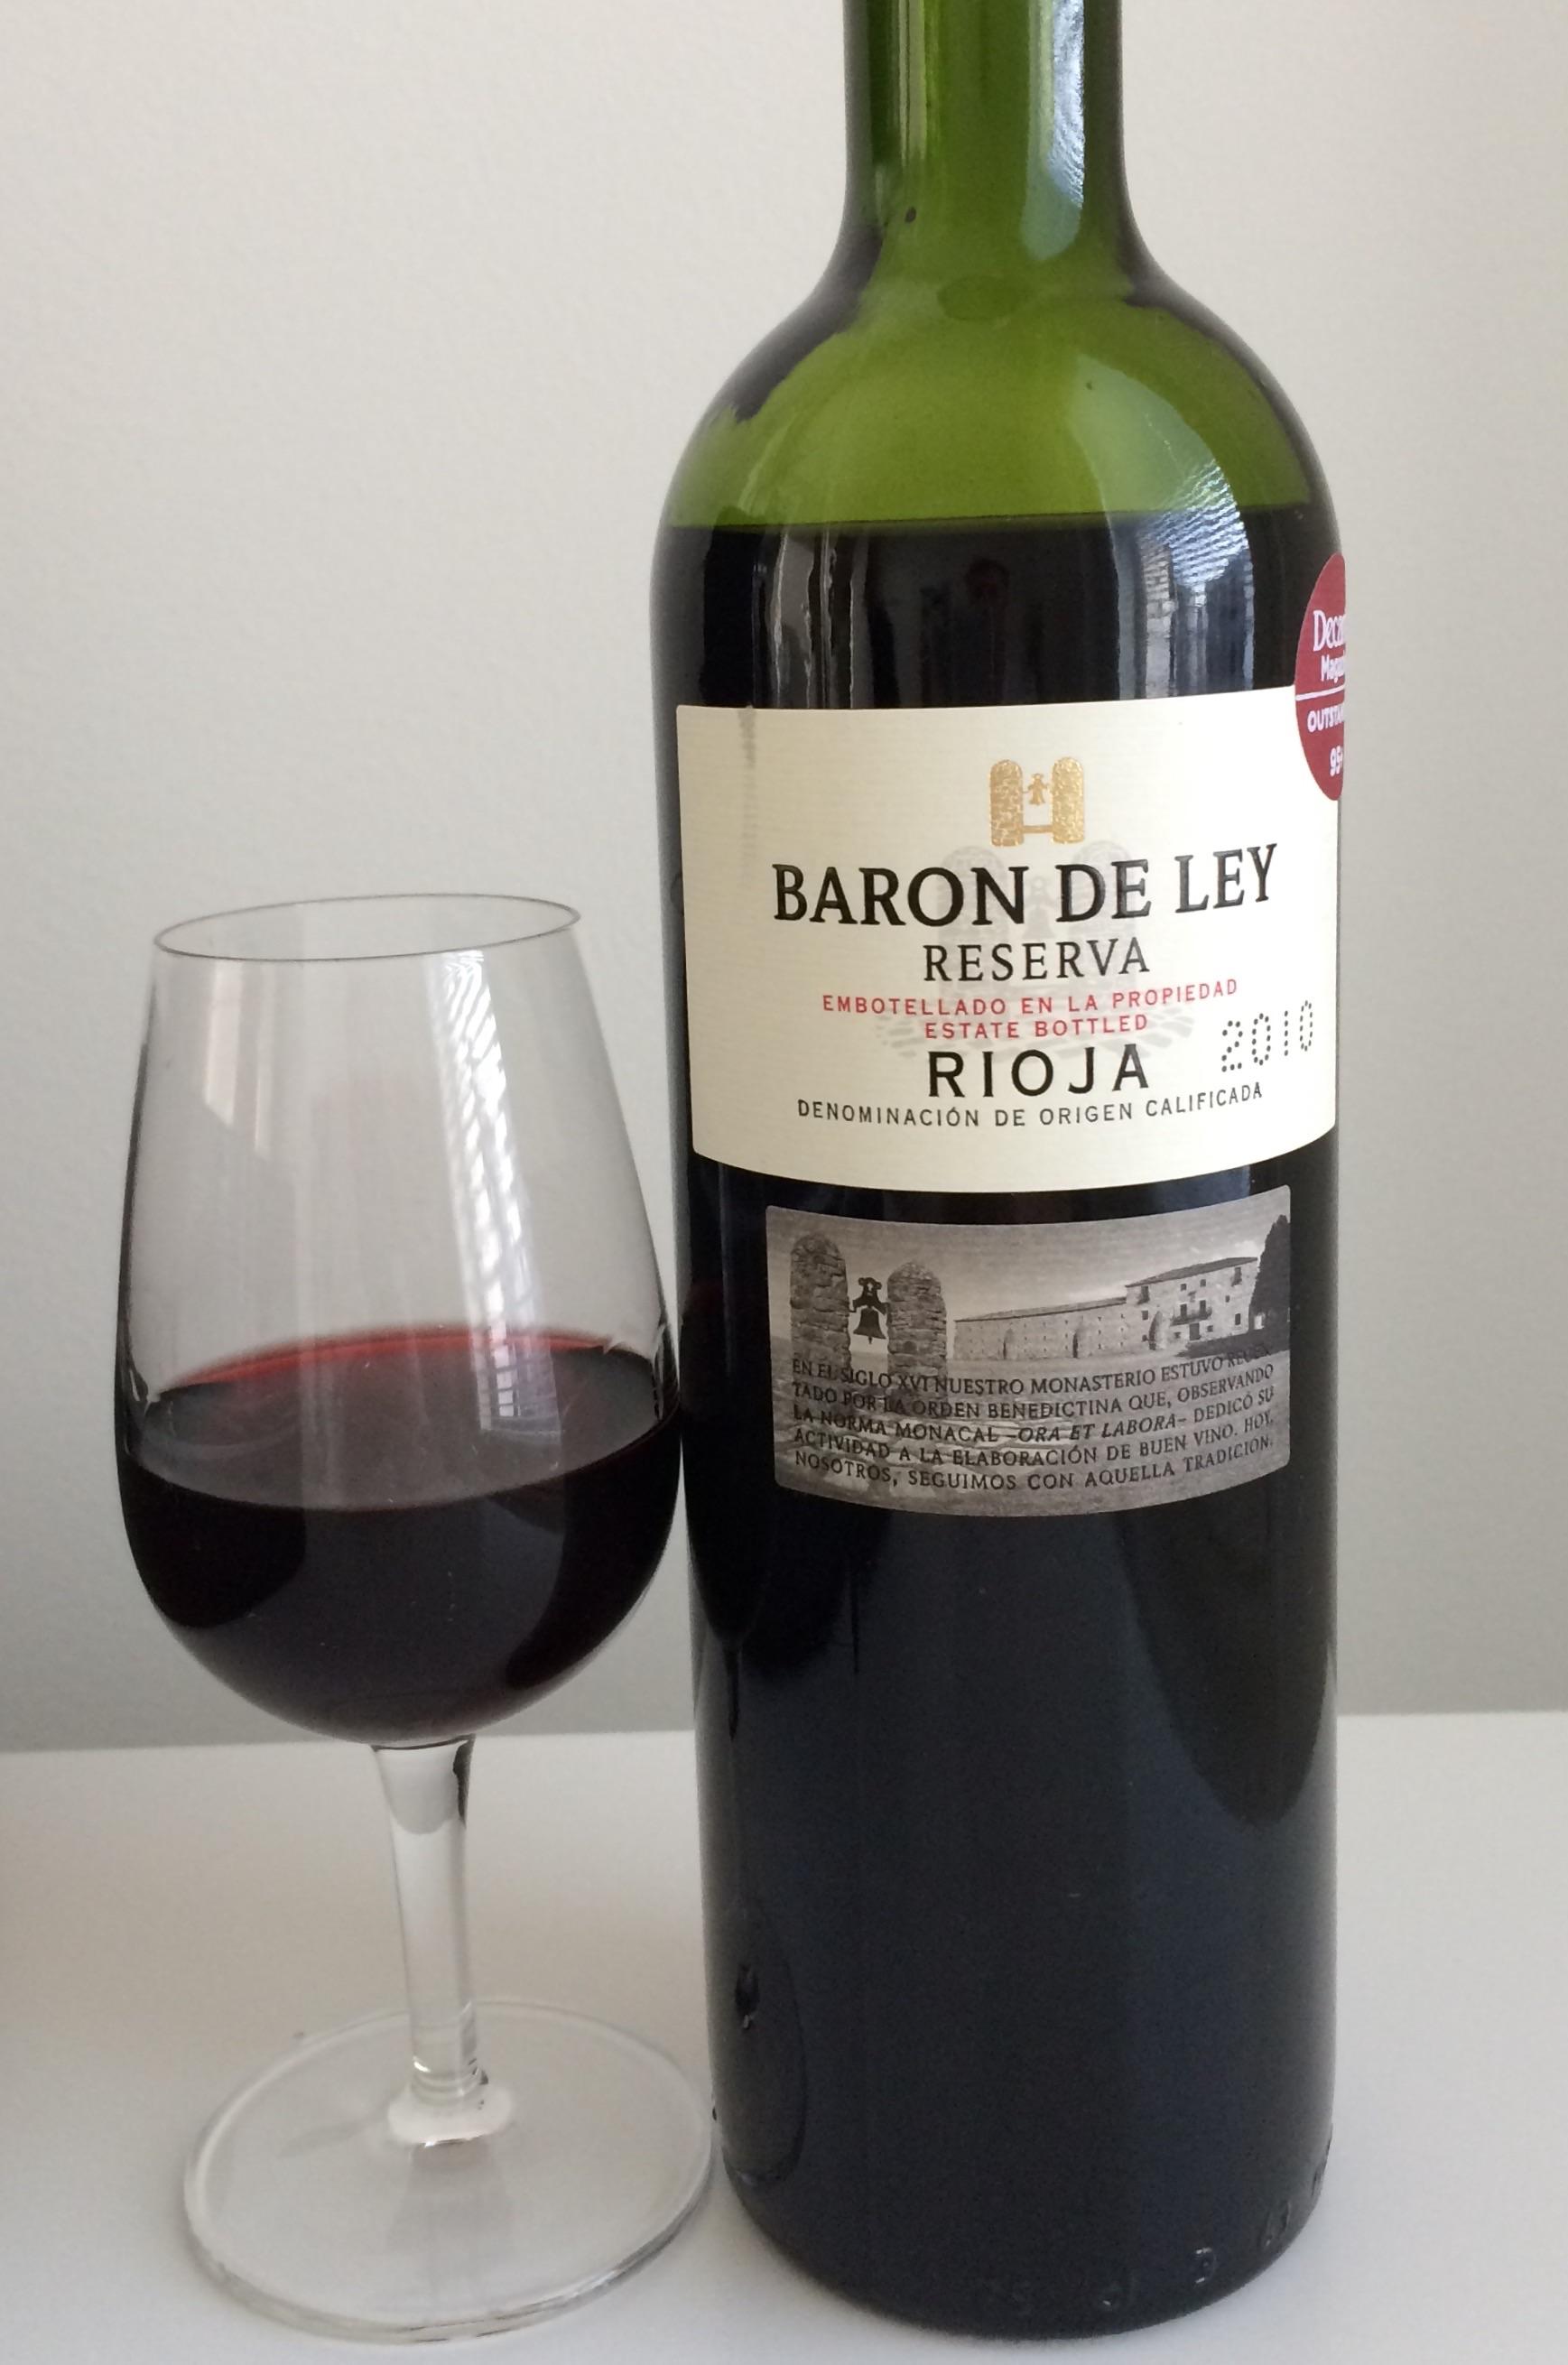 wine review baron de ley reserva 2010 reijosfood. Black Bedroom Furniture Sets. Home Design Ideas